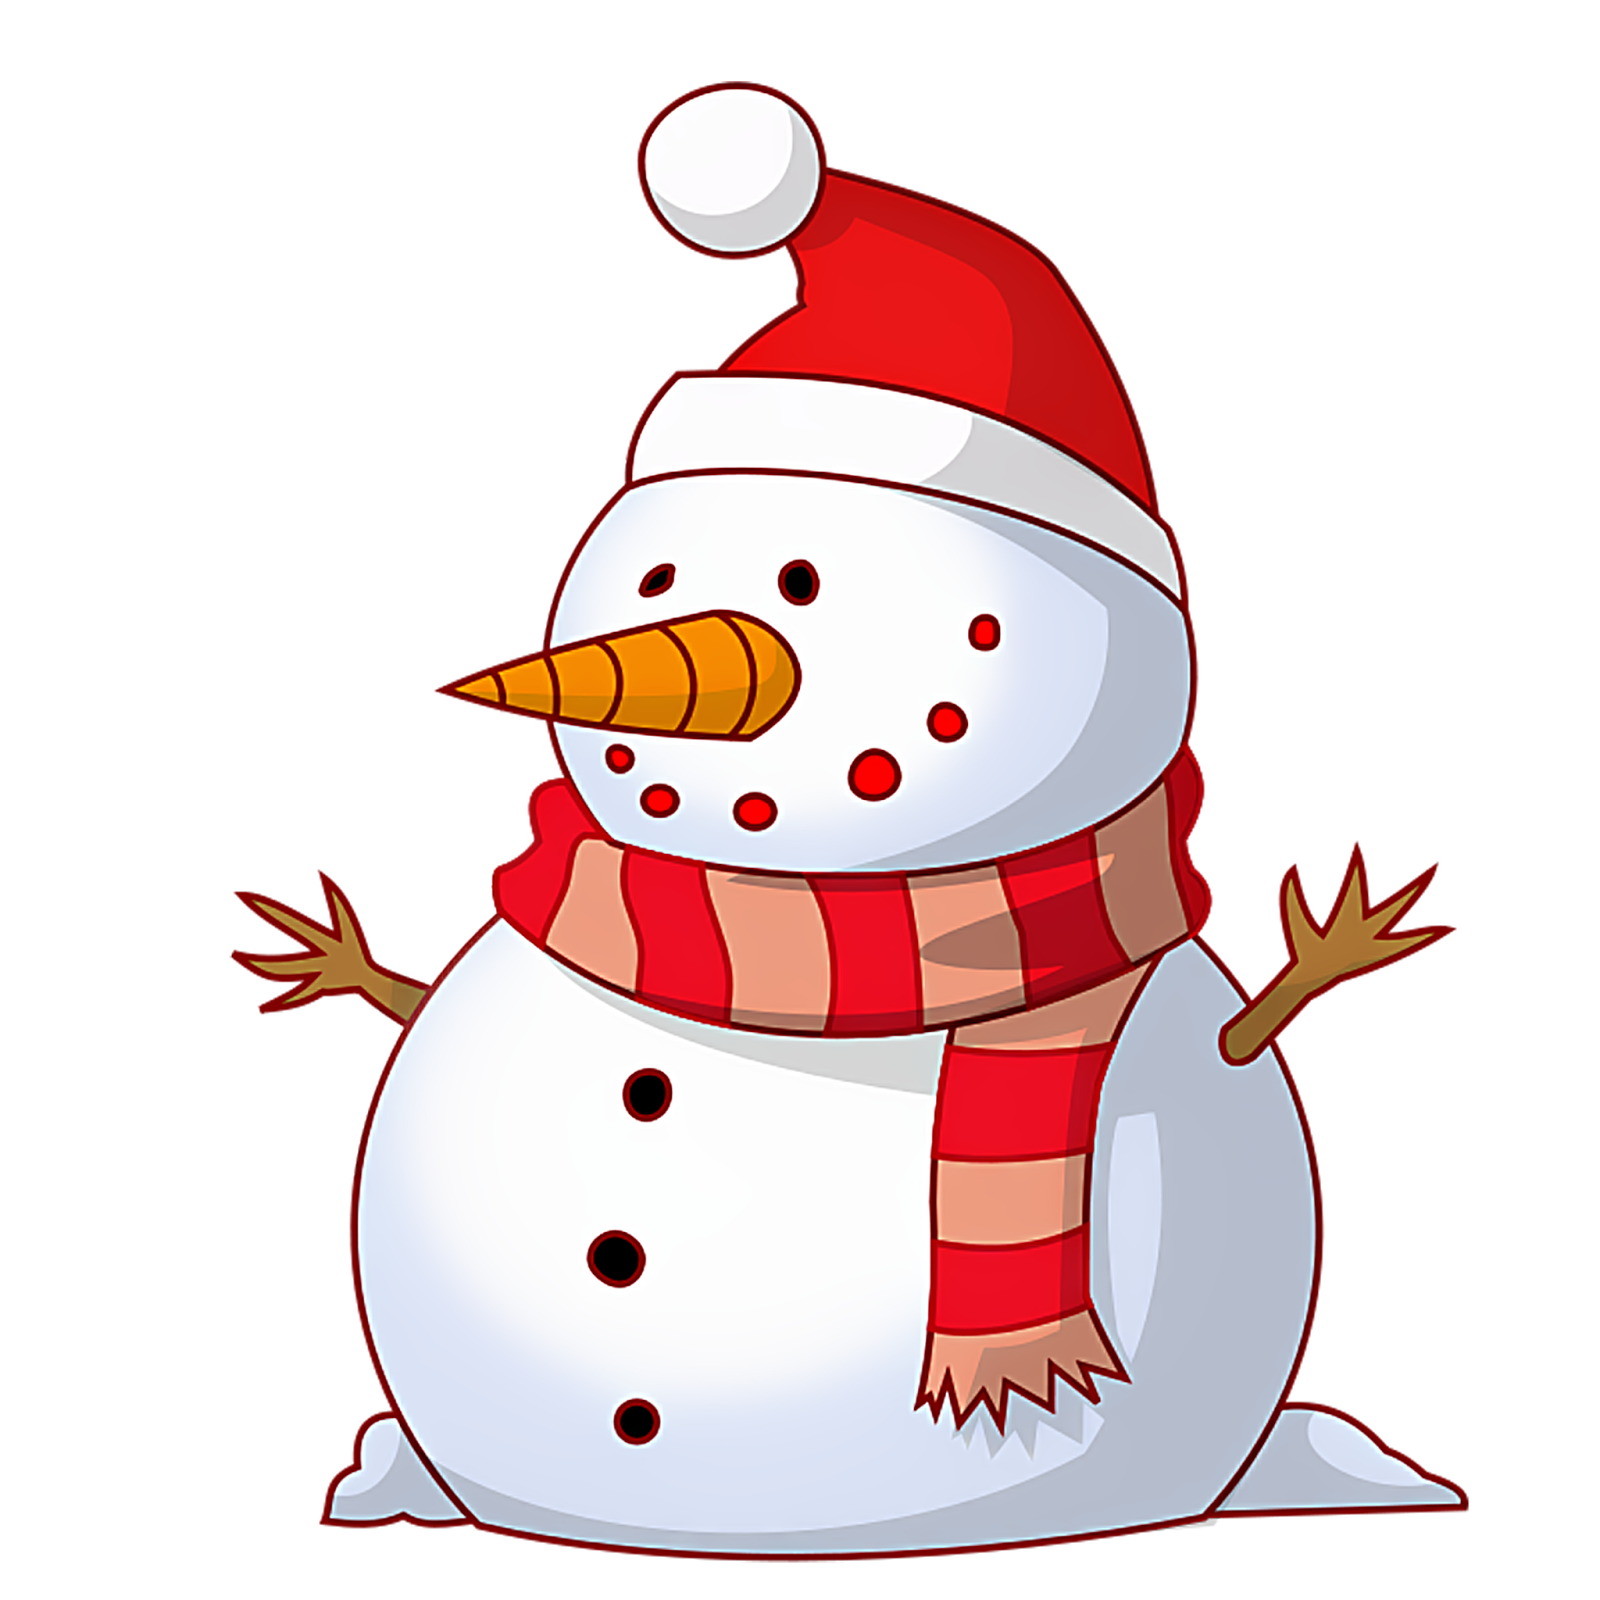 1600x1600 Gif Snowman Images Snowman Clip Art Free. It's The Most